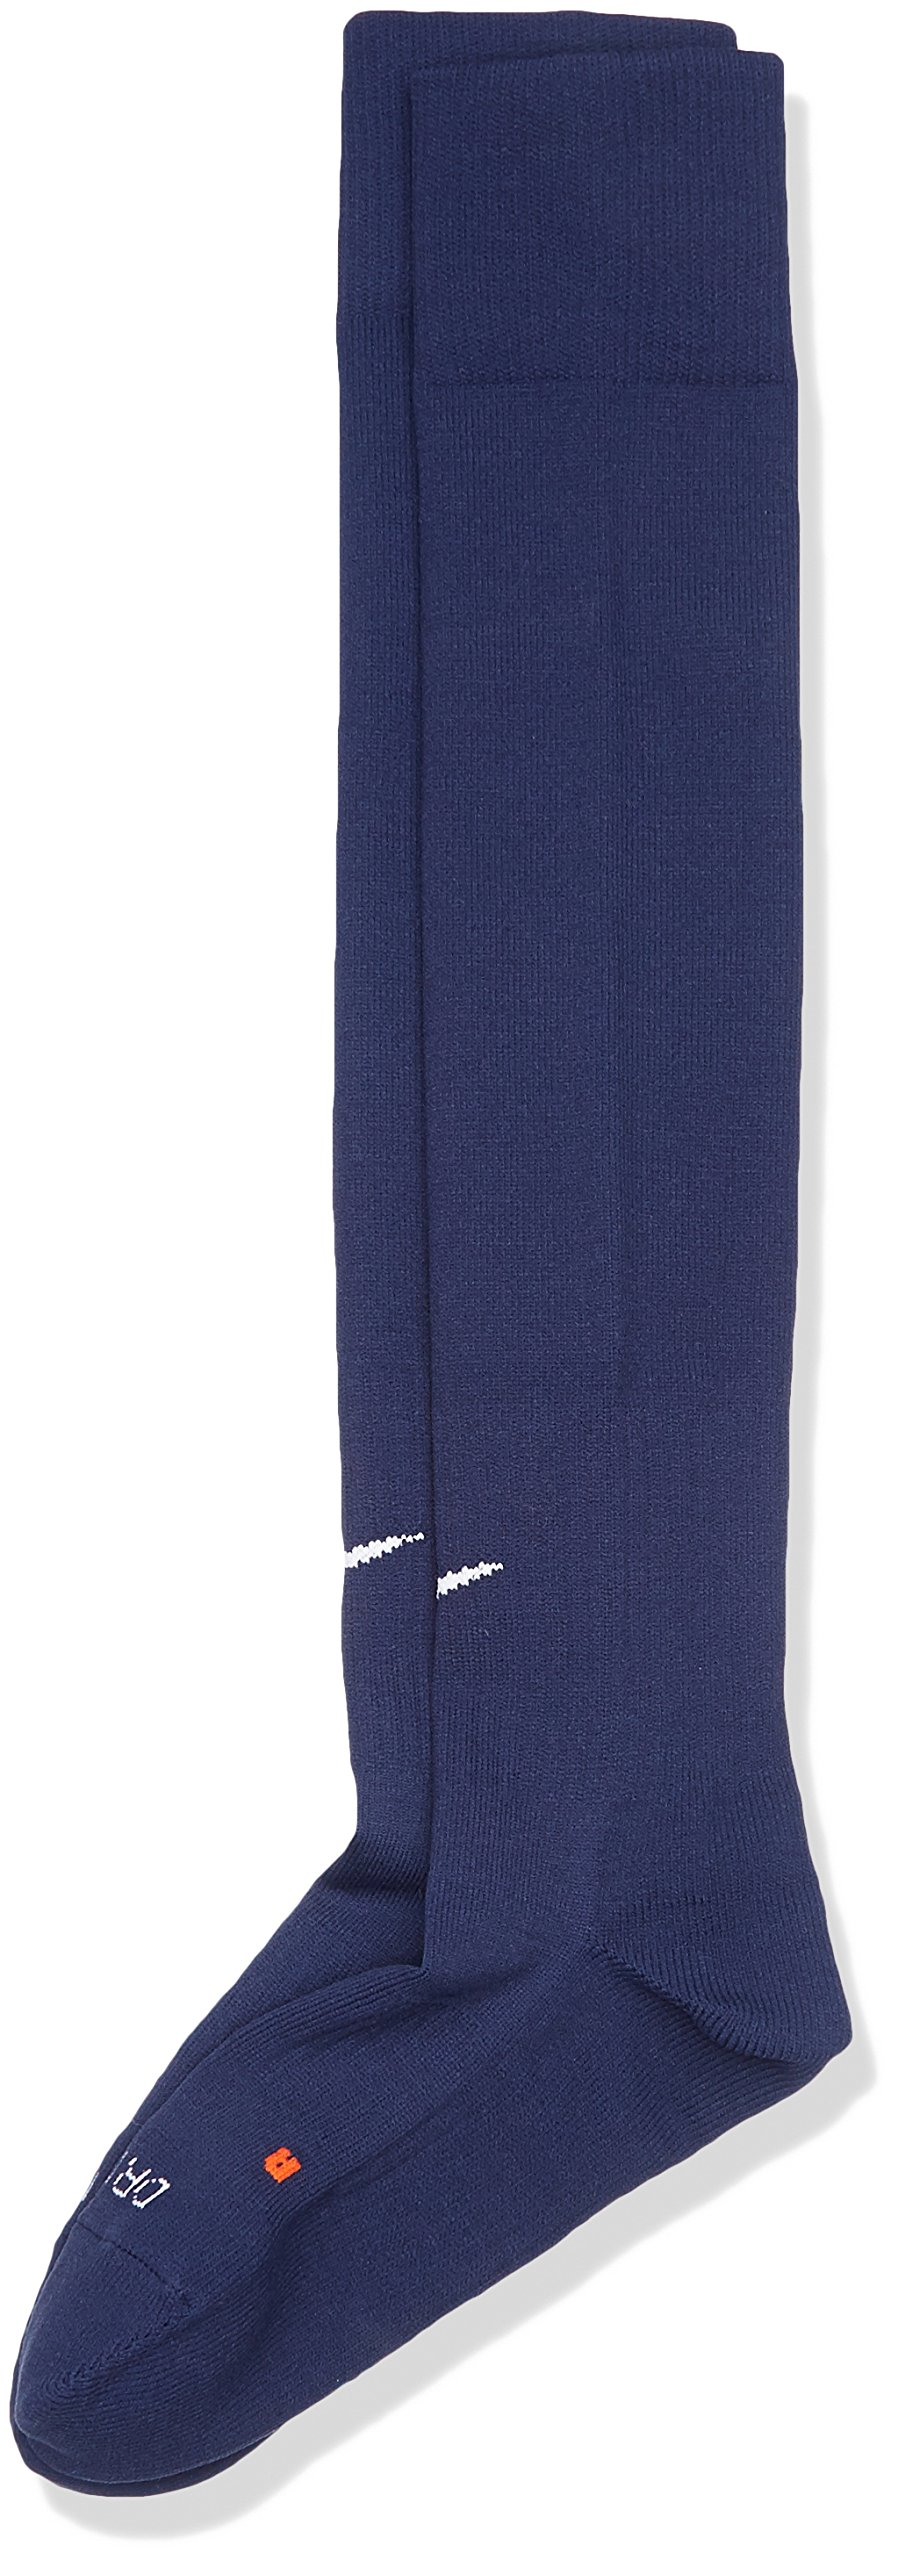 Nike Classic II Sock, Calcetines Unisex, Multicolor (Dark Blue/White),